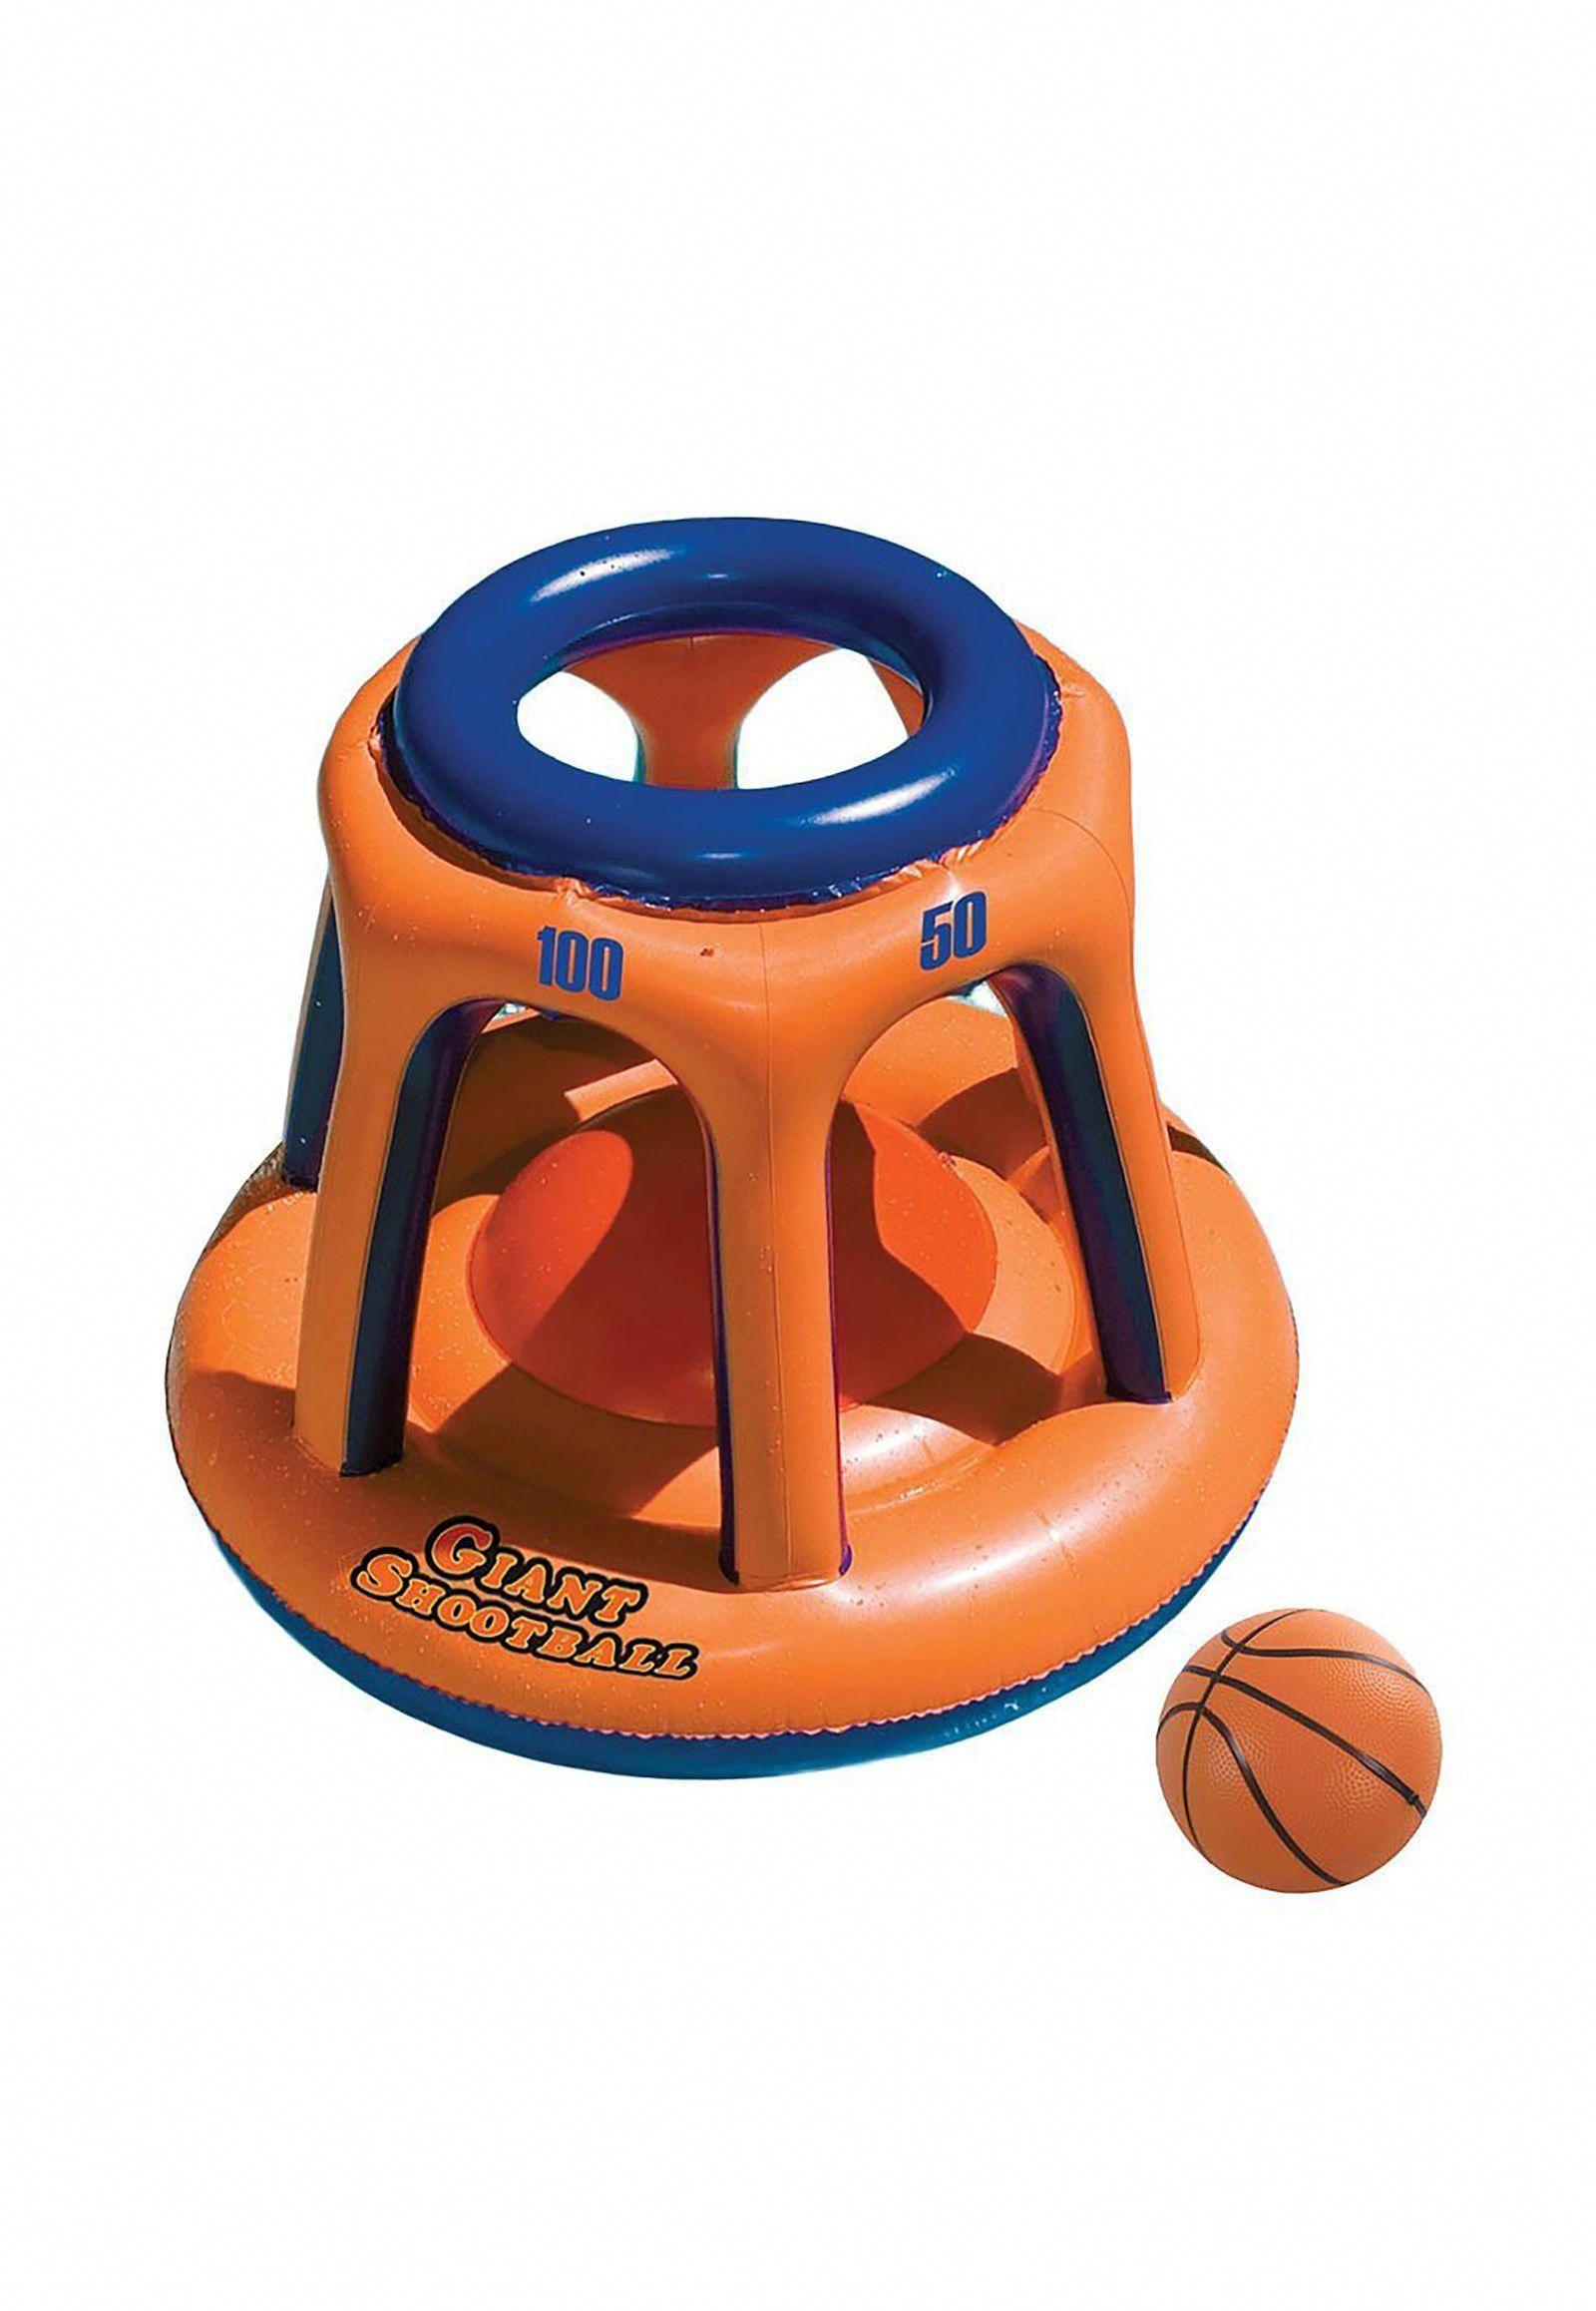 Basketball Open Gym Near Me Basketballbasics Id 6558788862 Kidsbasketballgames Swimming Pool Games Pool Games Basketball Games For Kids